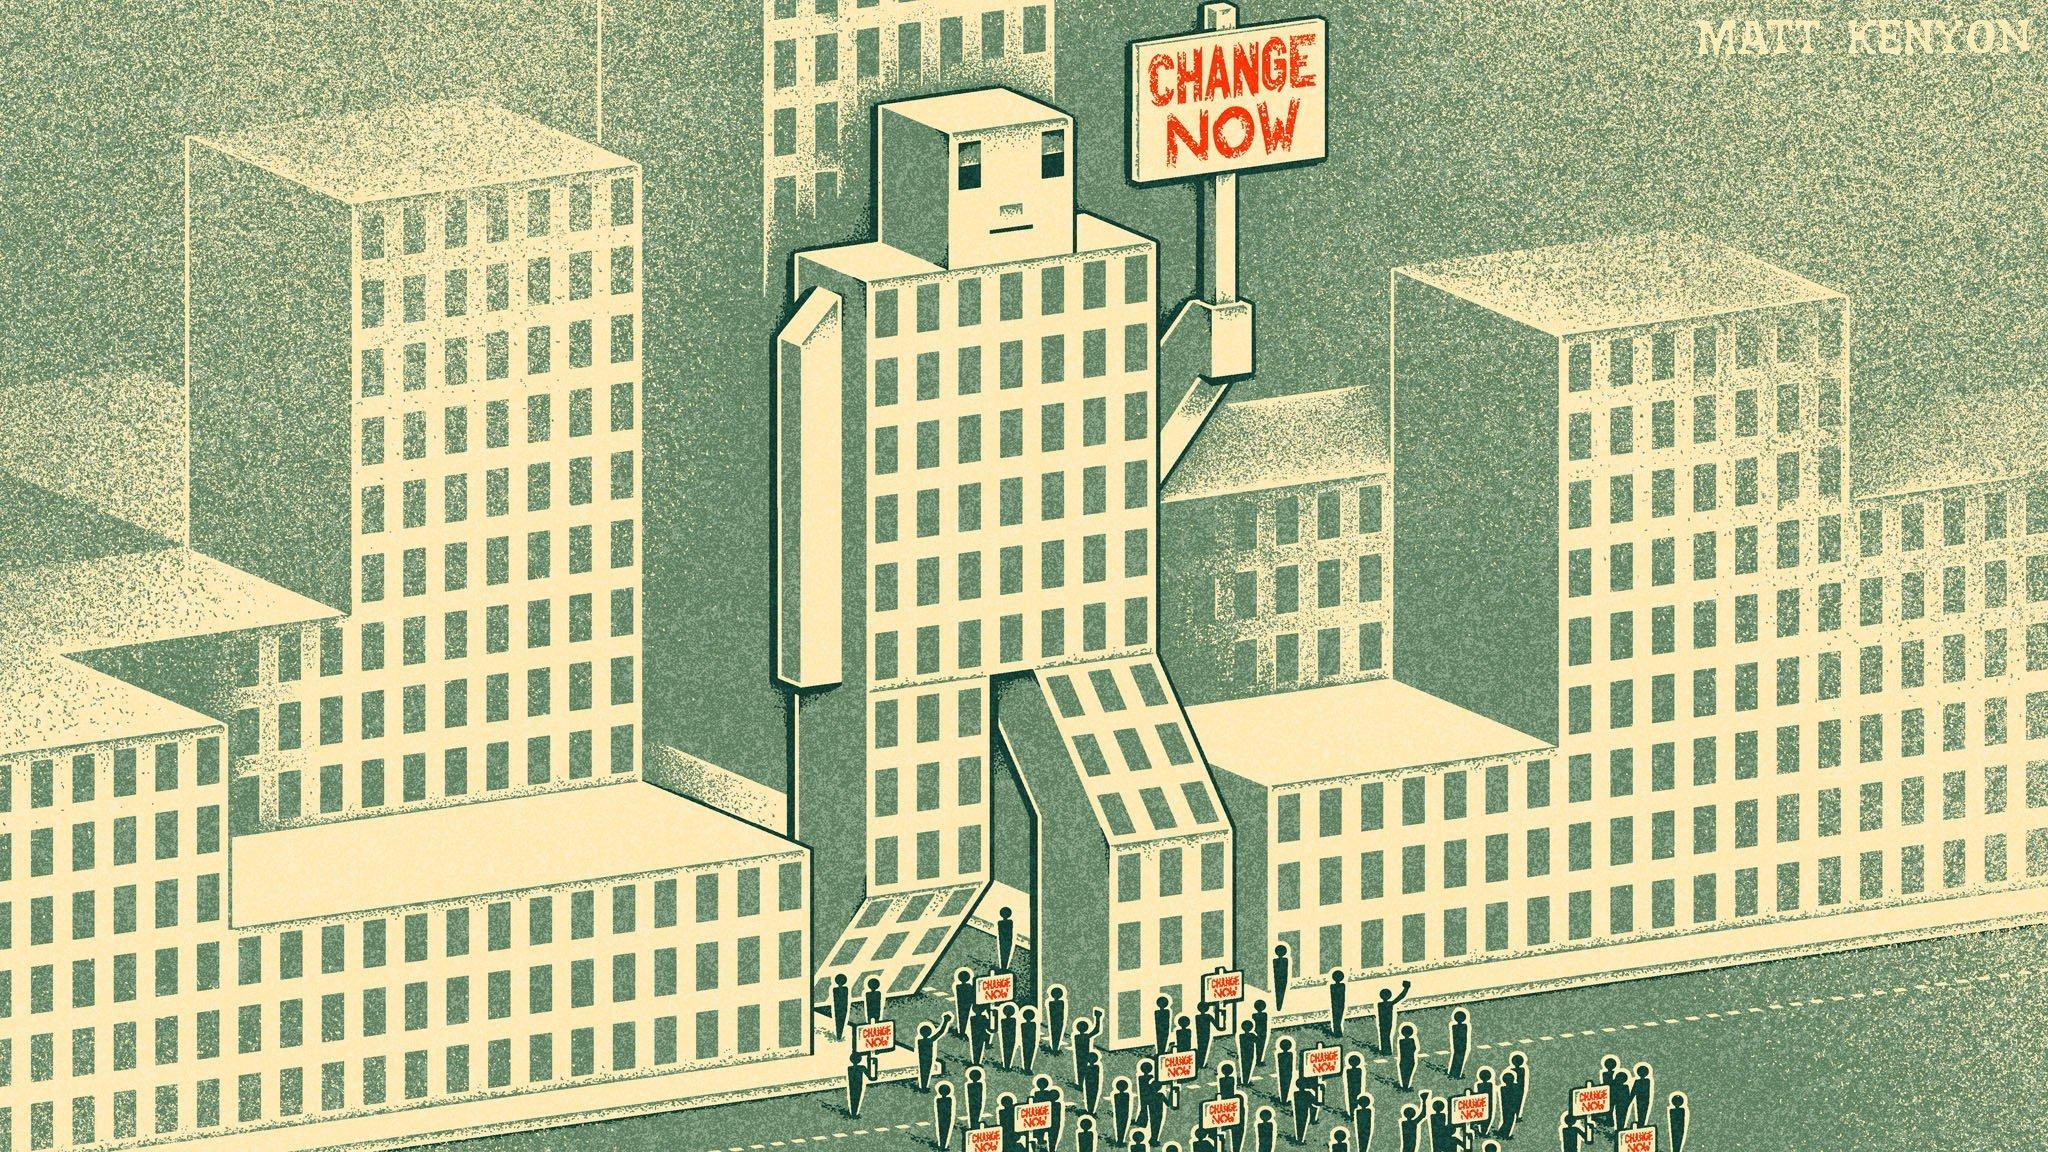 Shareholders Urban Group will help